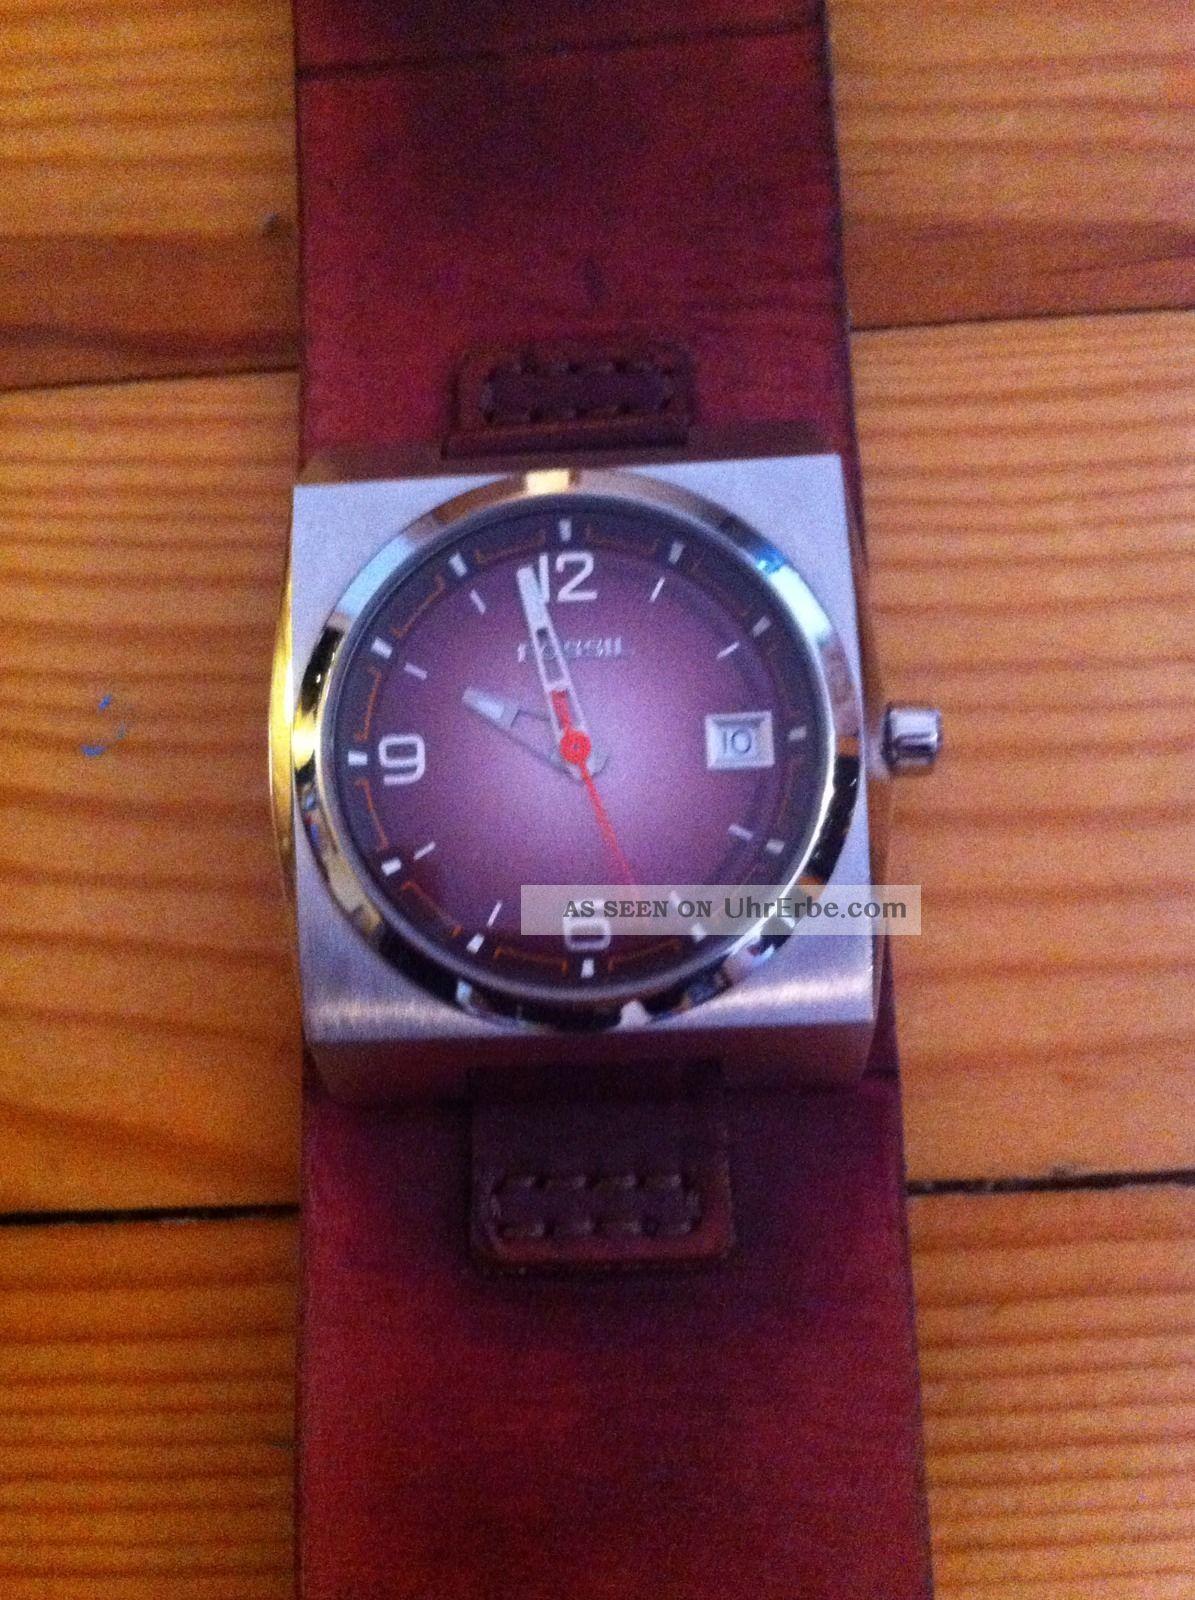 Fossil Herrenuhr Jr 9650 Braun Armbanduhren Bild